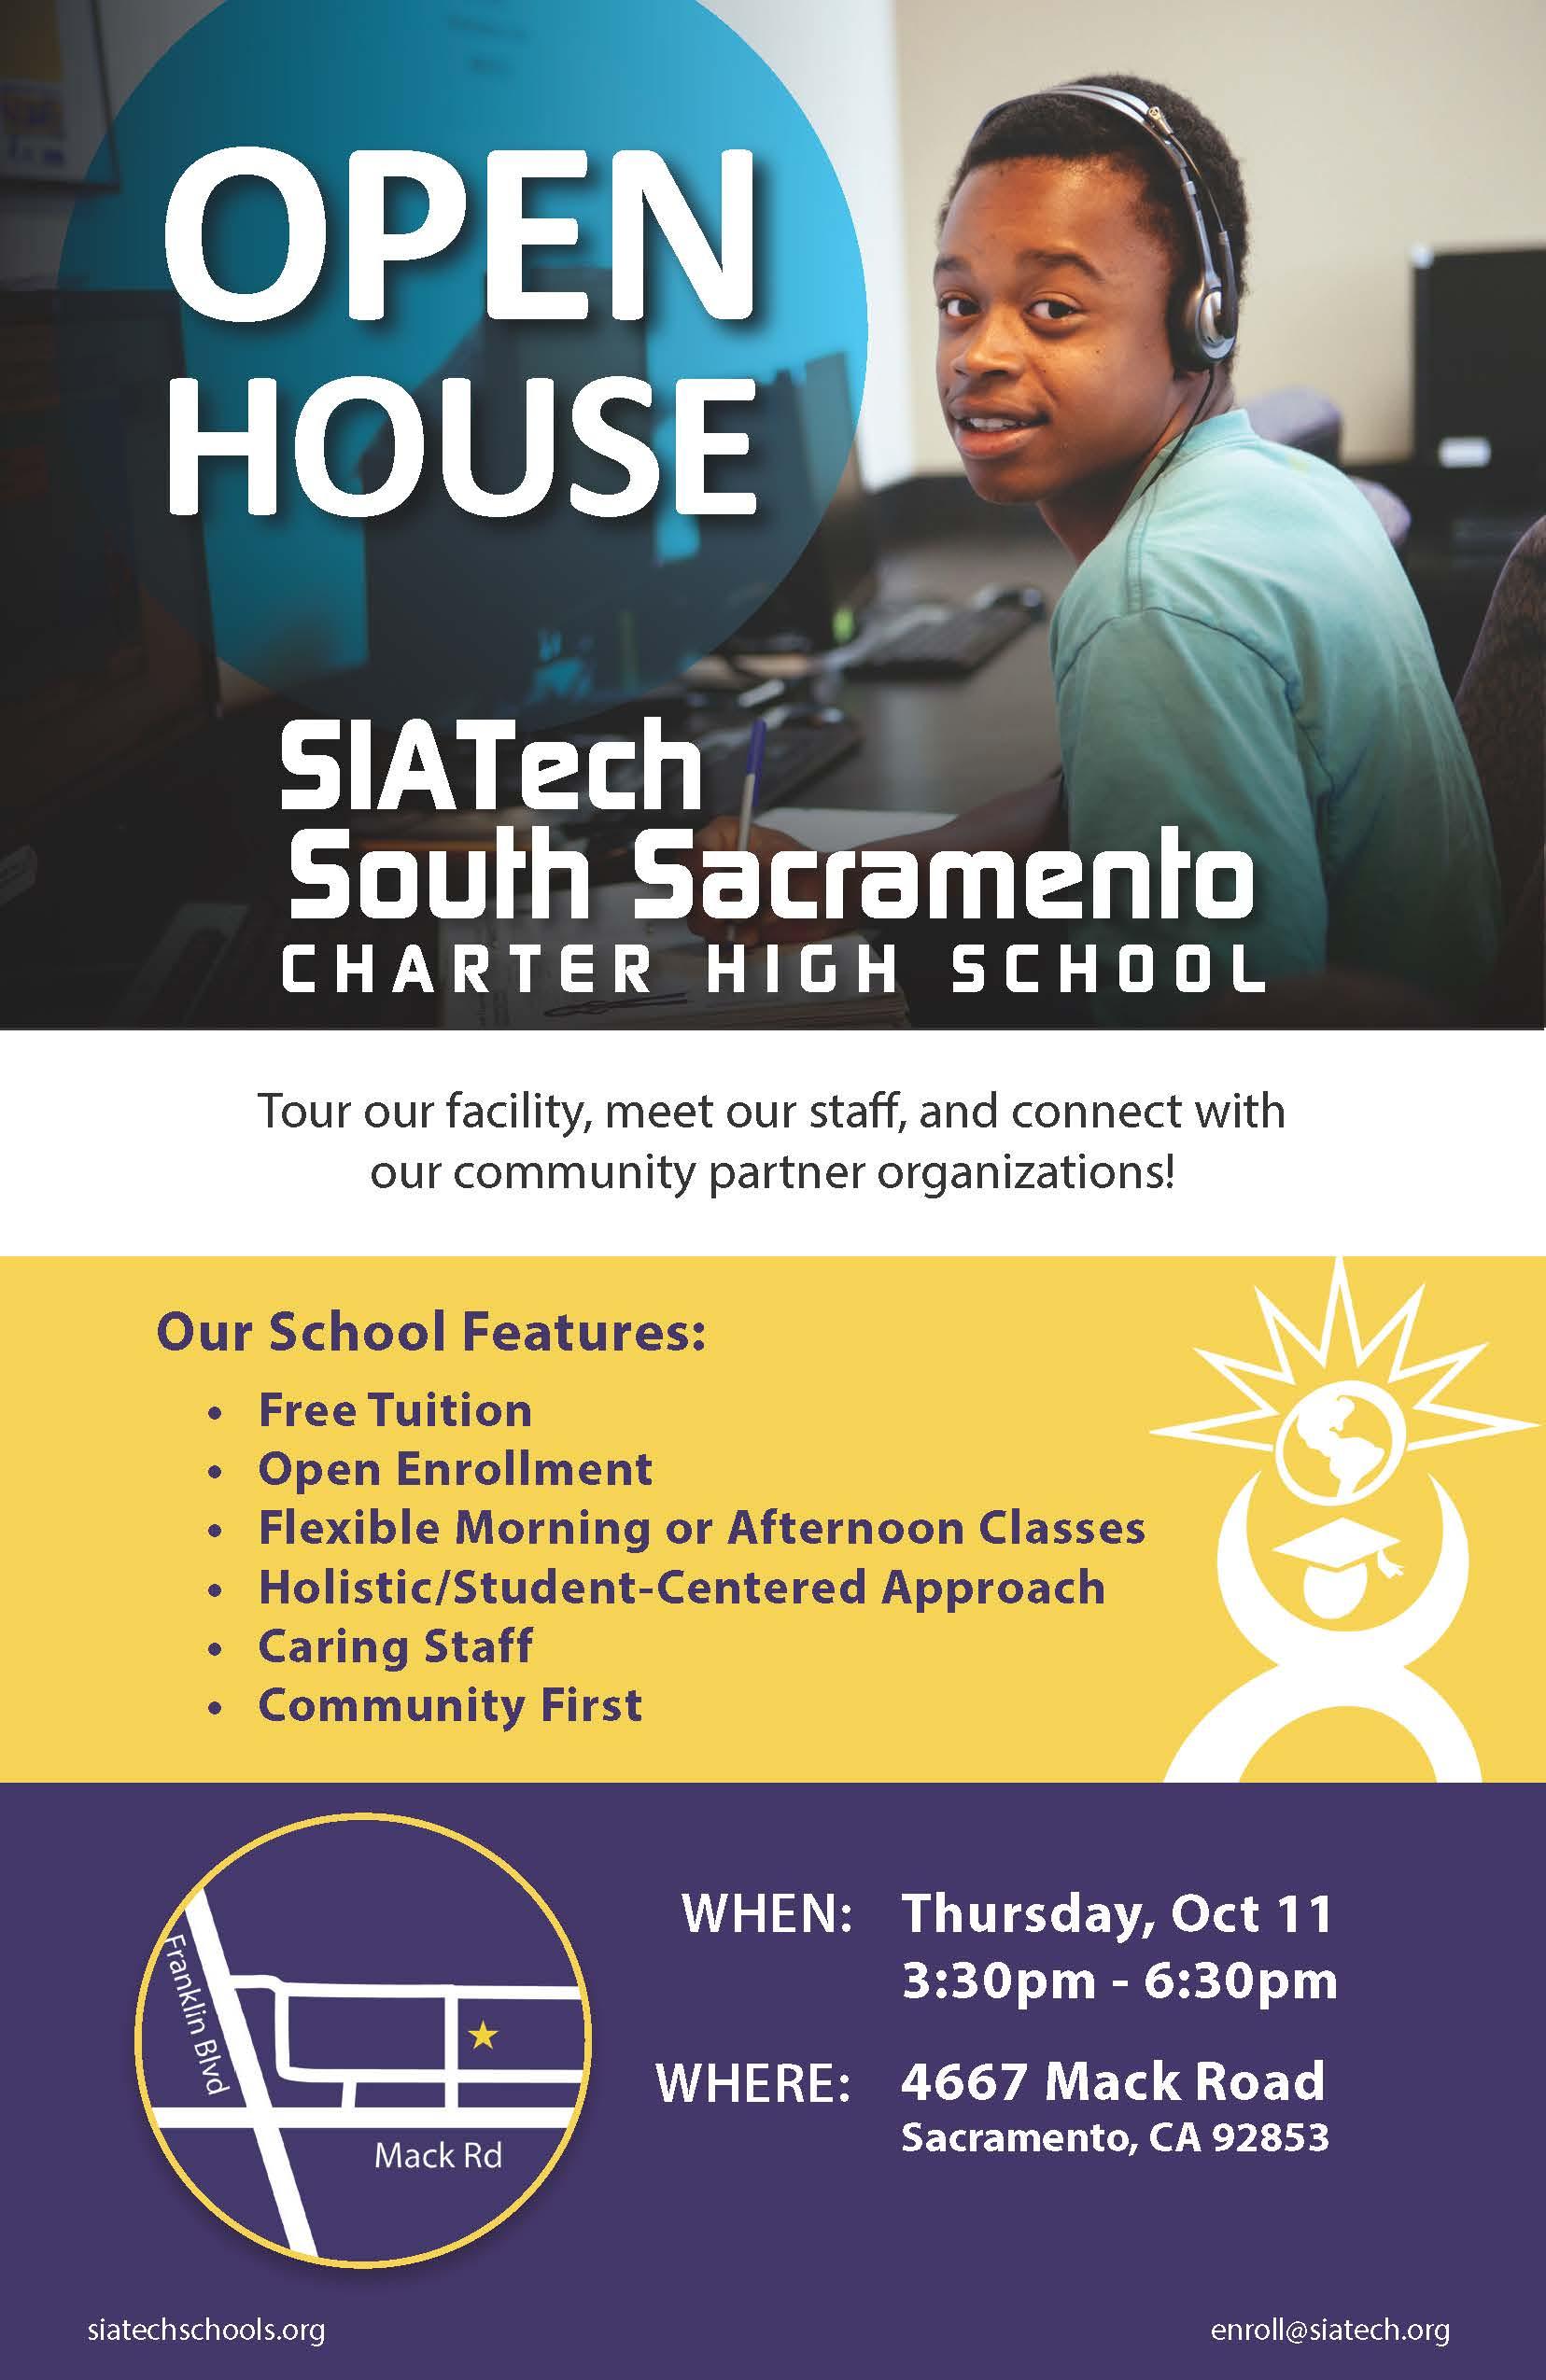 Siatech South Sacramento Charter High School Siatech Charter